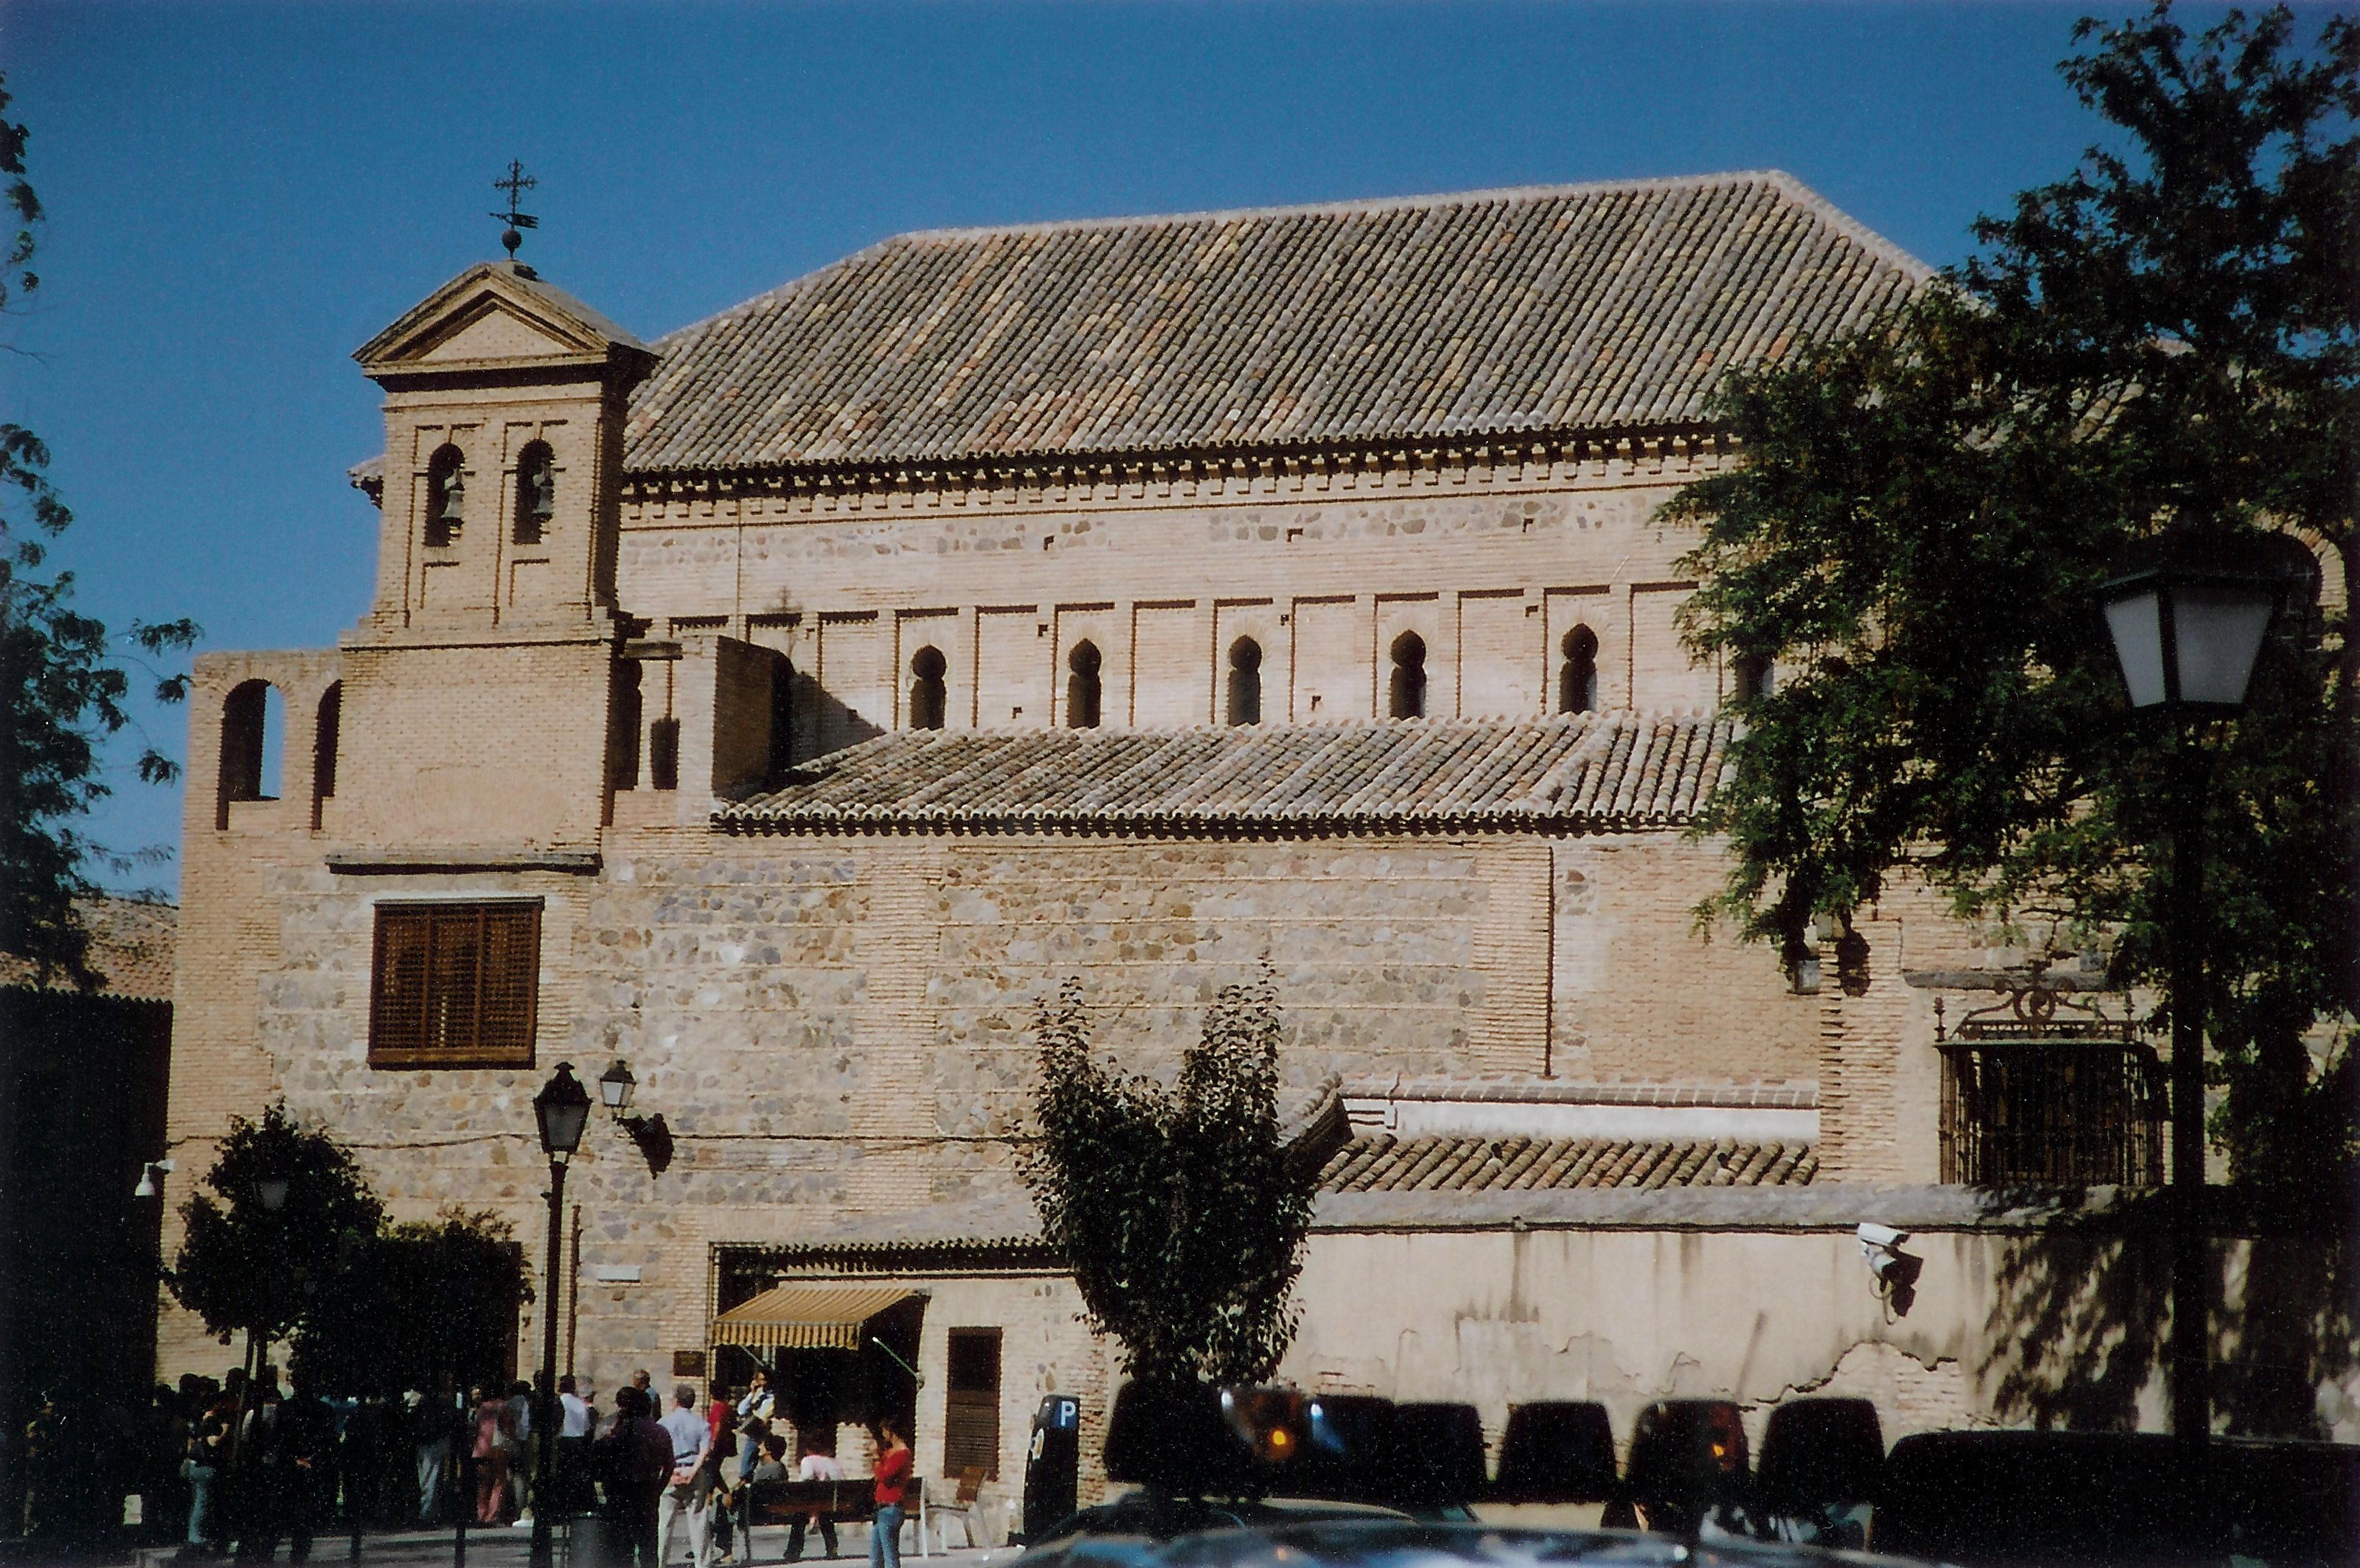 File:Toledo Transito.jpg - Wikimedia Commons